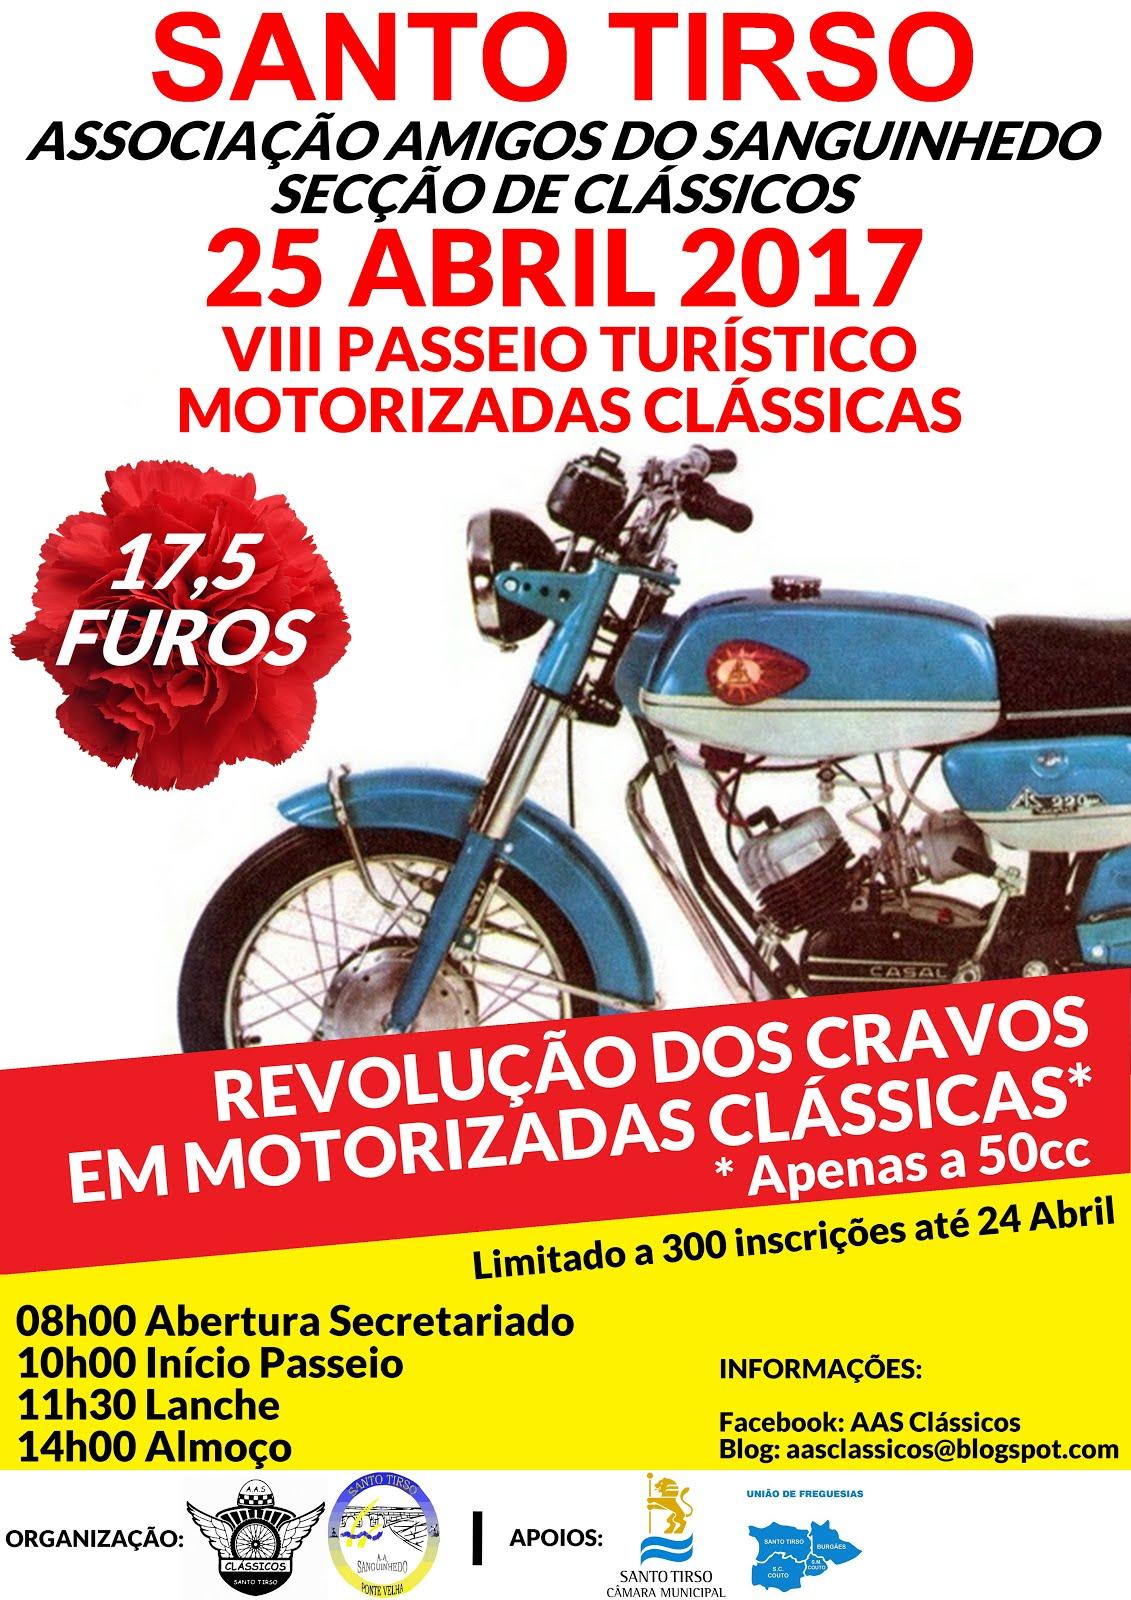 VIII Passeio Turístico de Motorizadas Clássicas - 25 Abril 2017